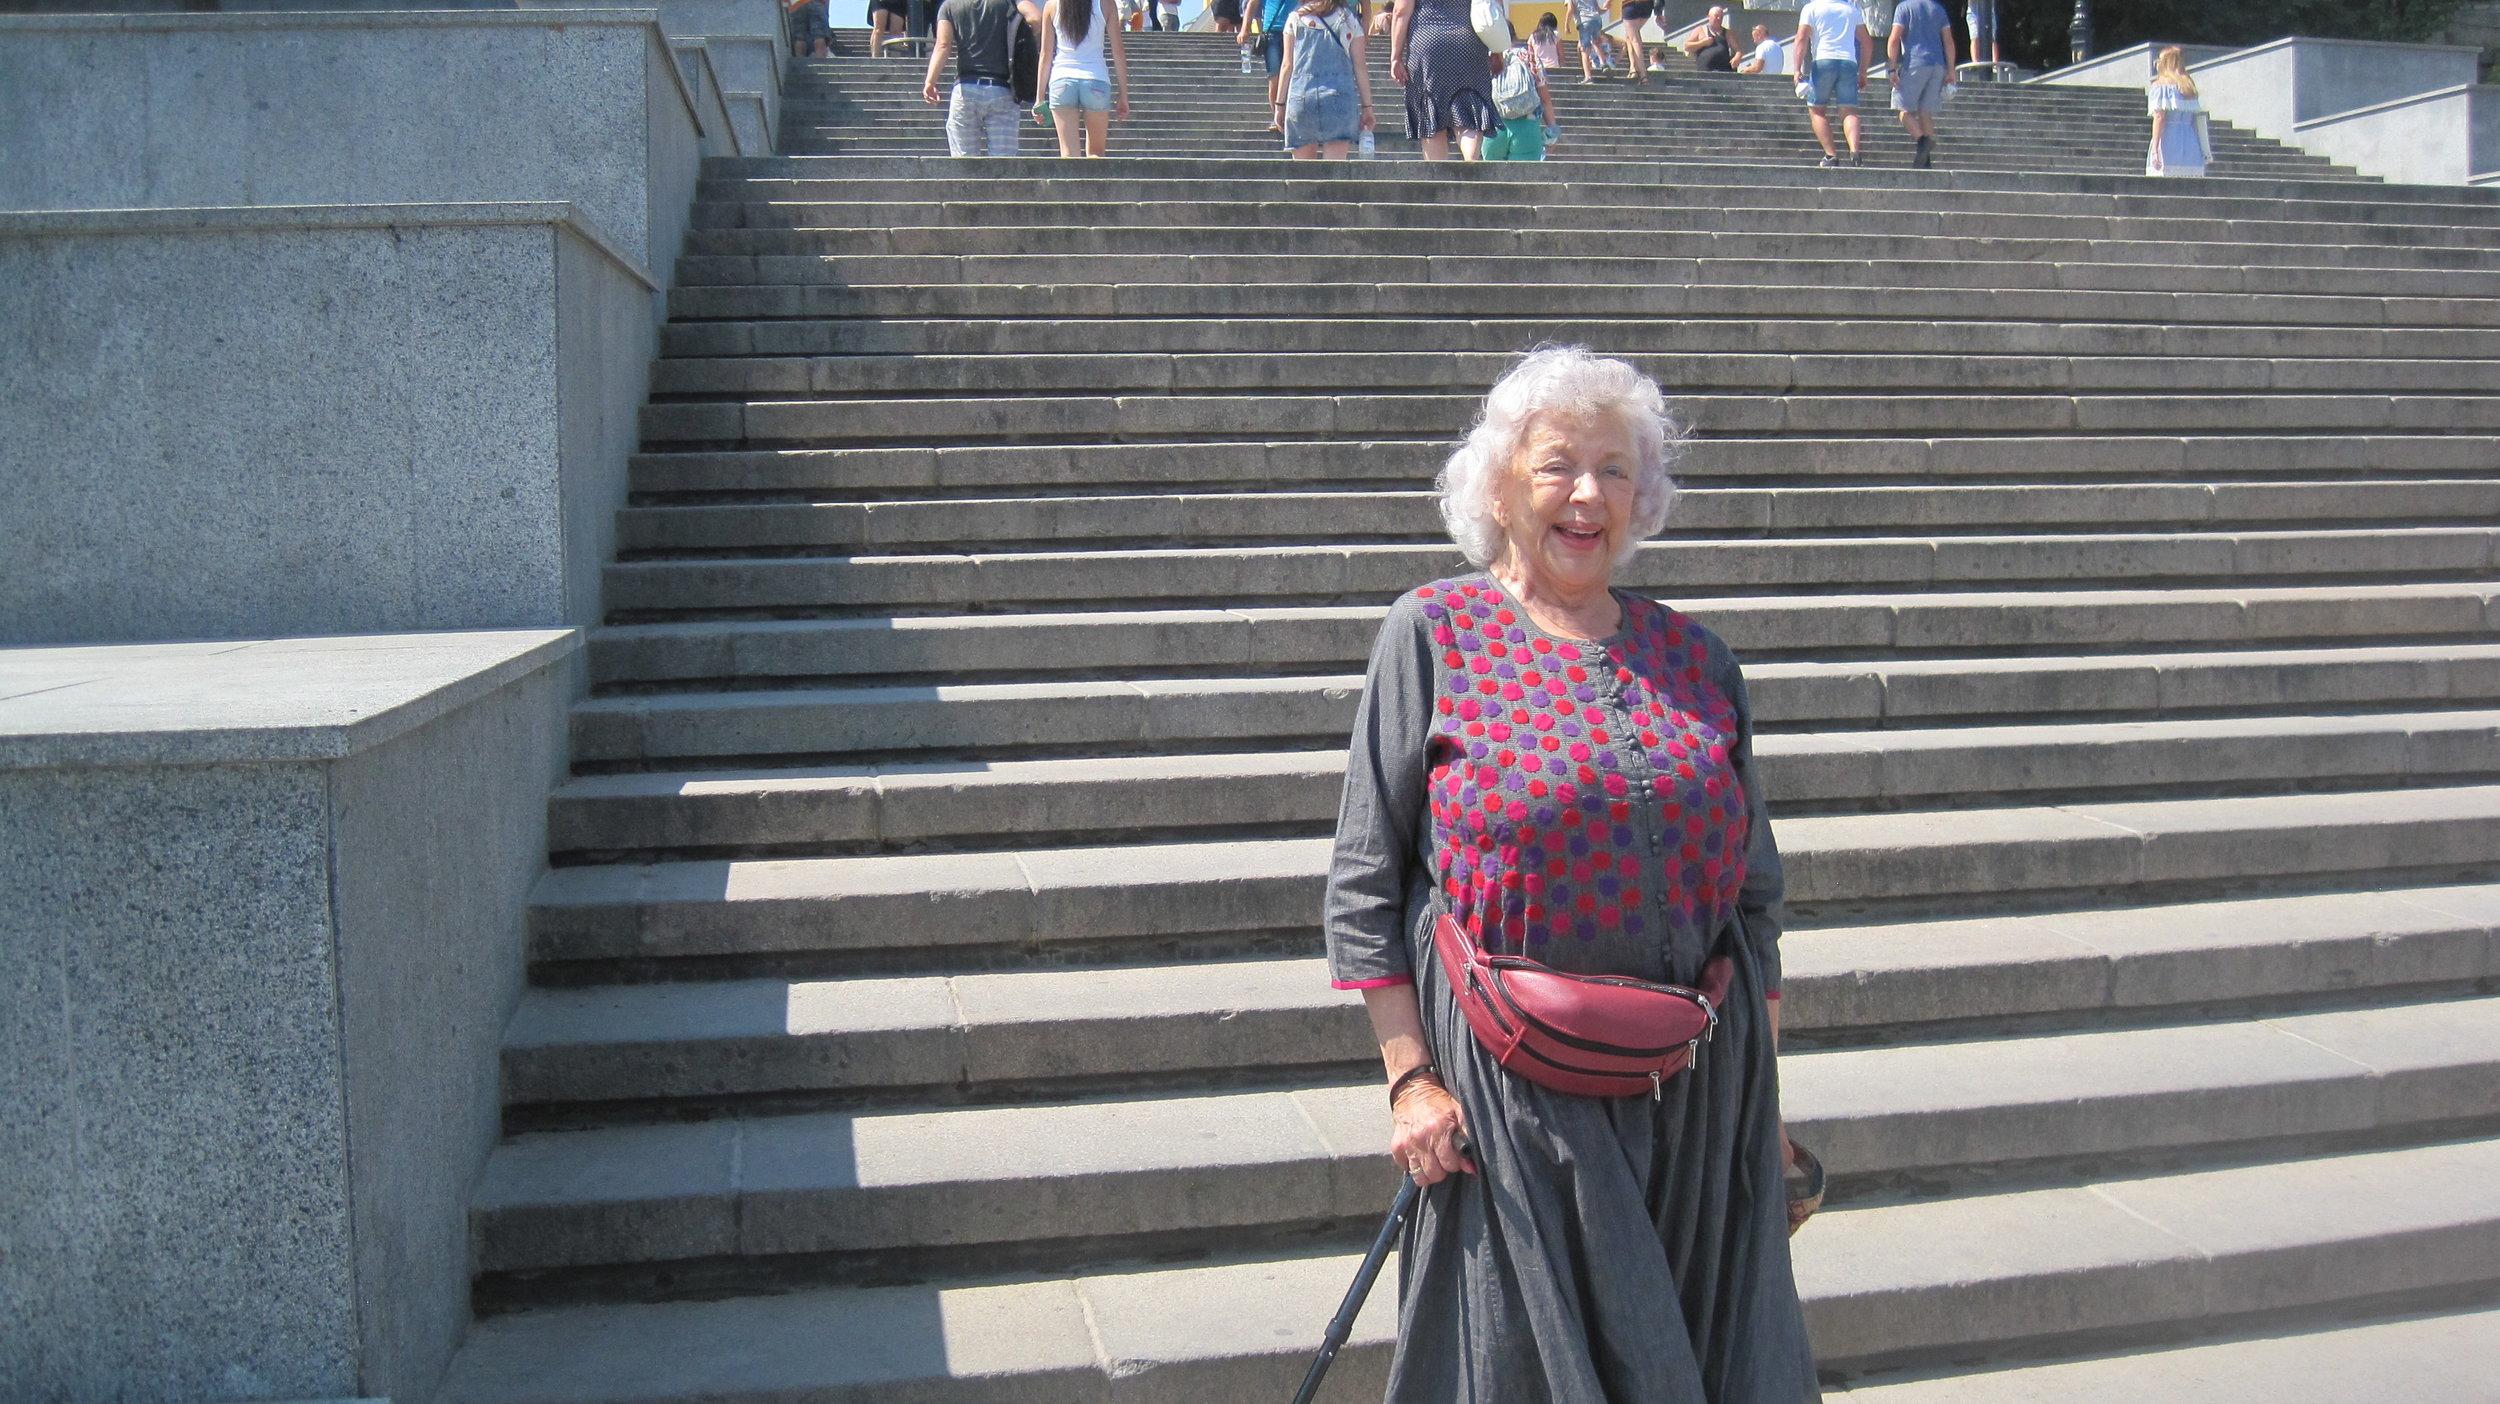 On the famous steps Odessa, Ukraine